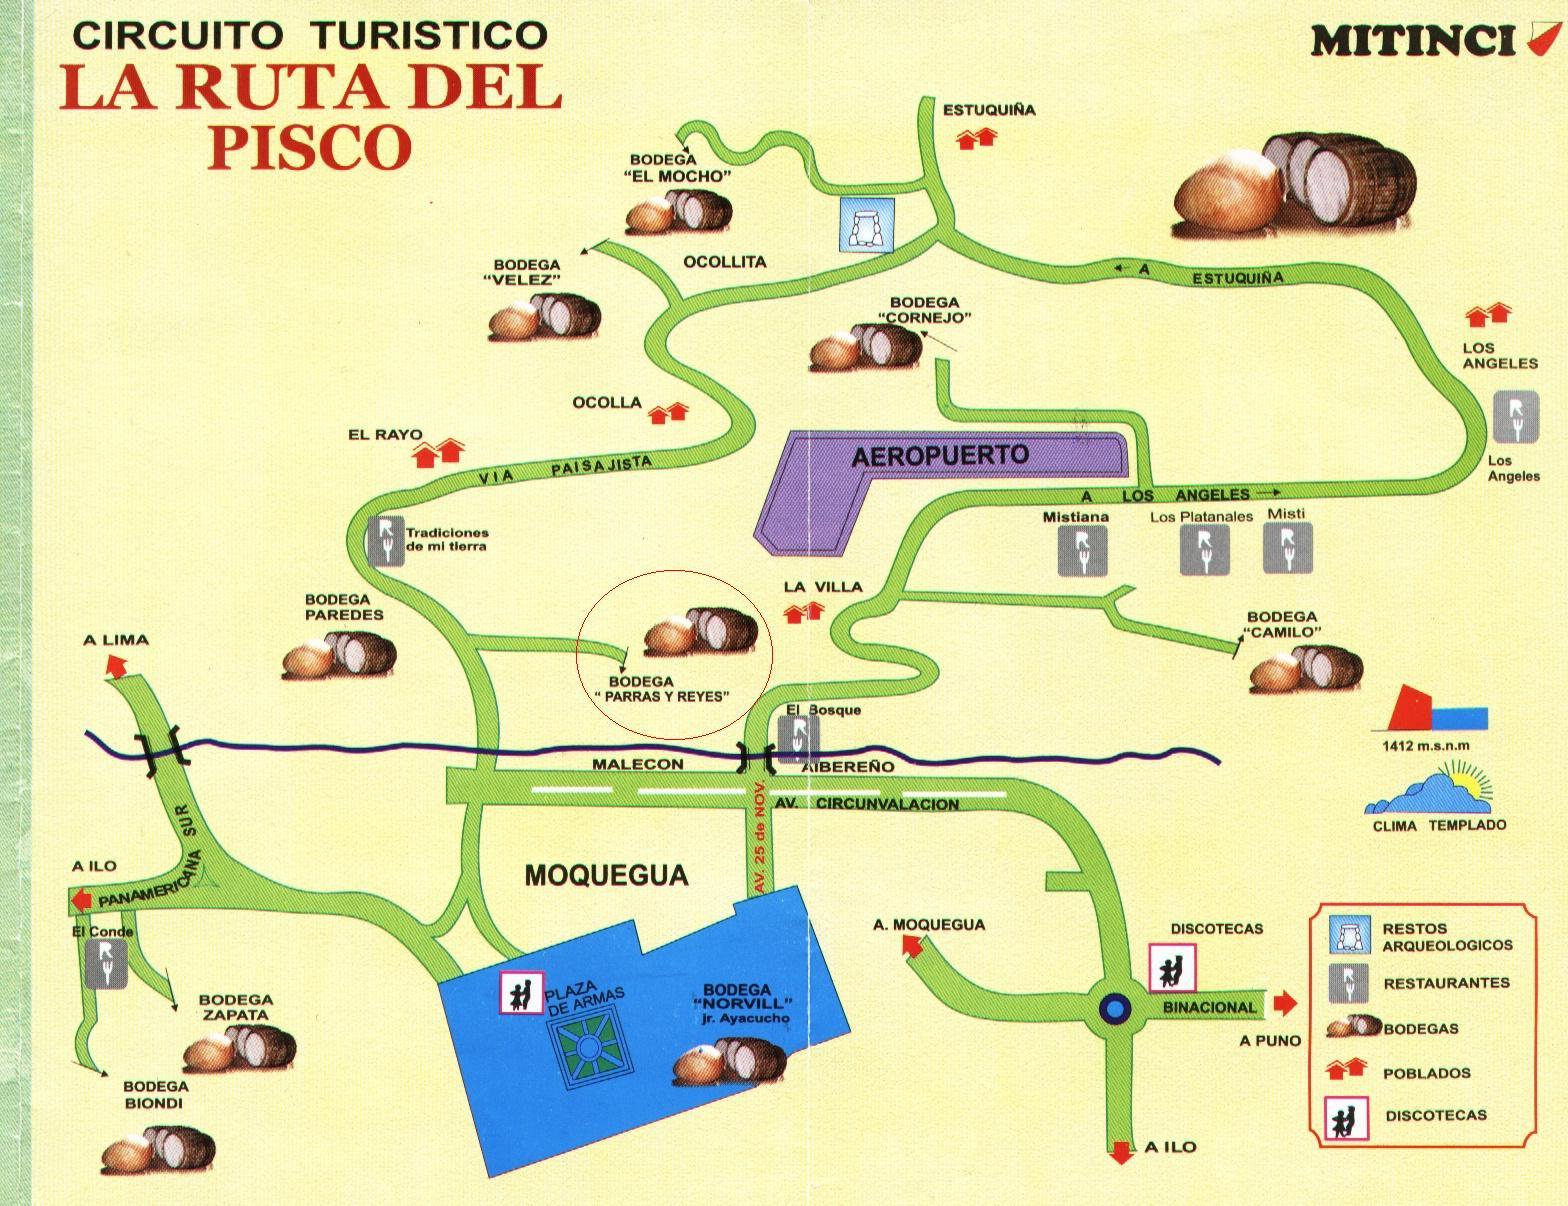 Circuito Turístico la Ruta del Pisco - Moquegua Perú ( HagaClick ...